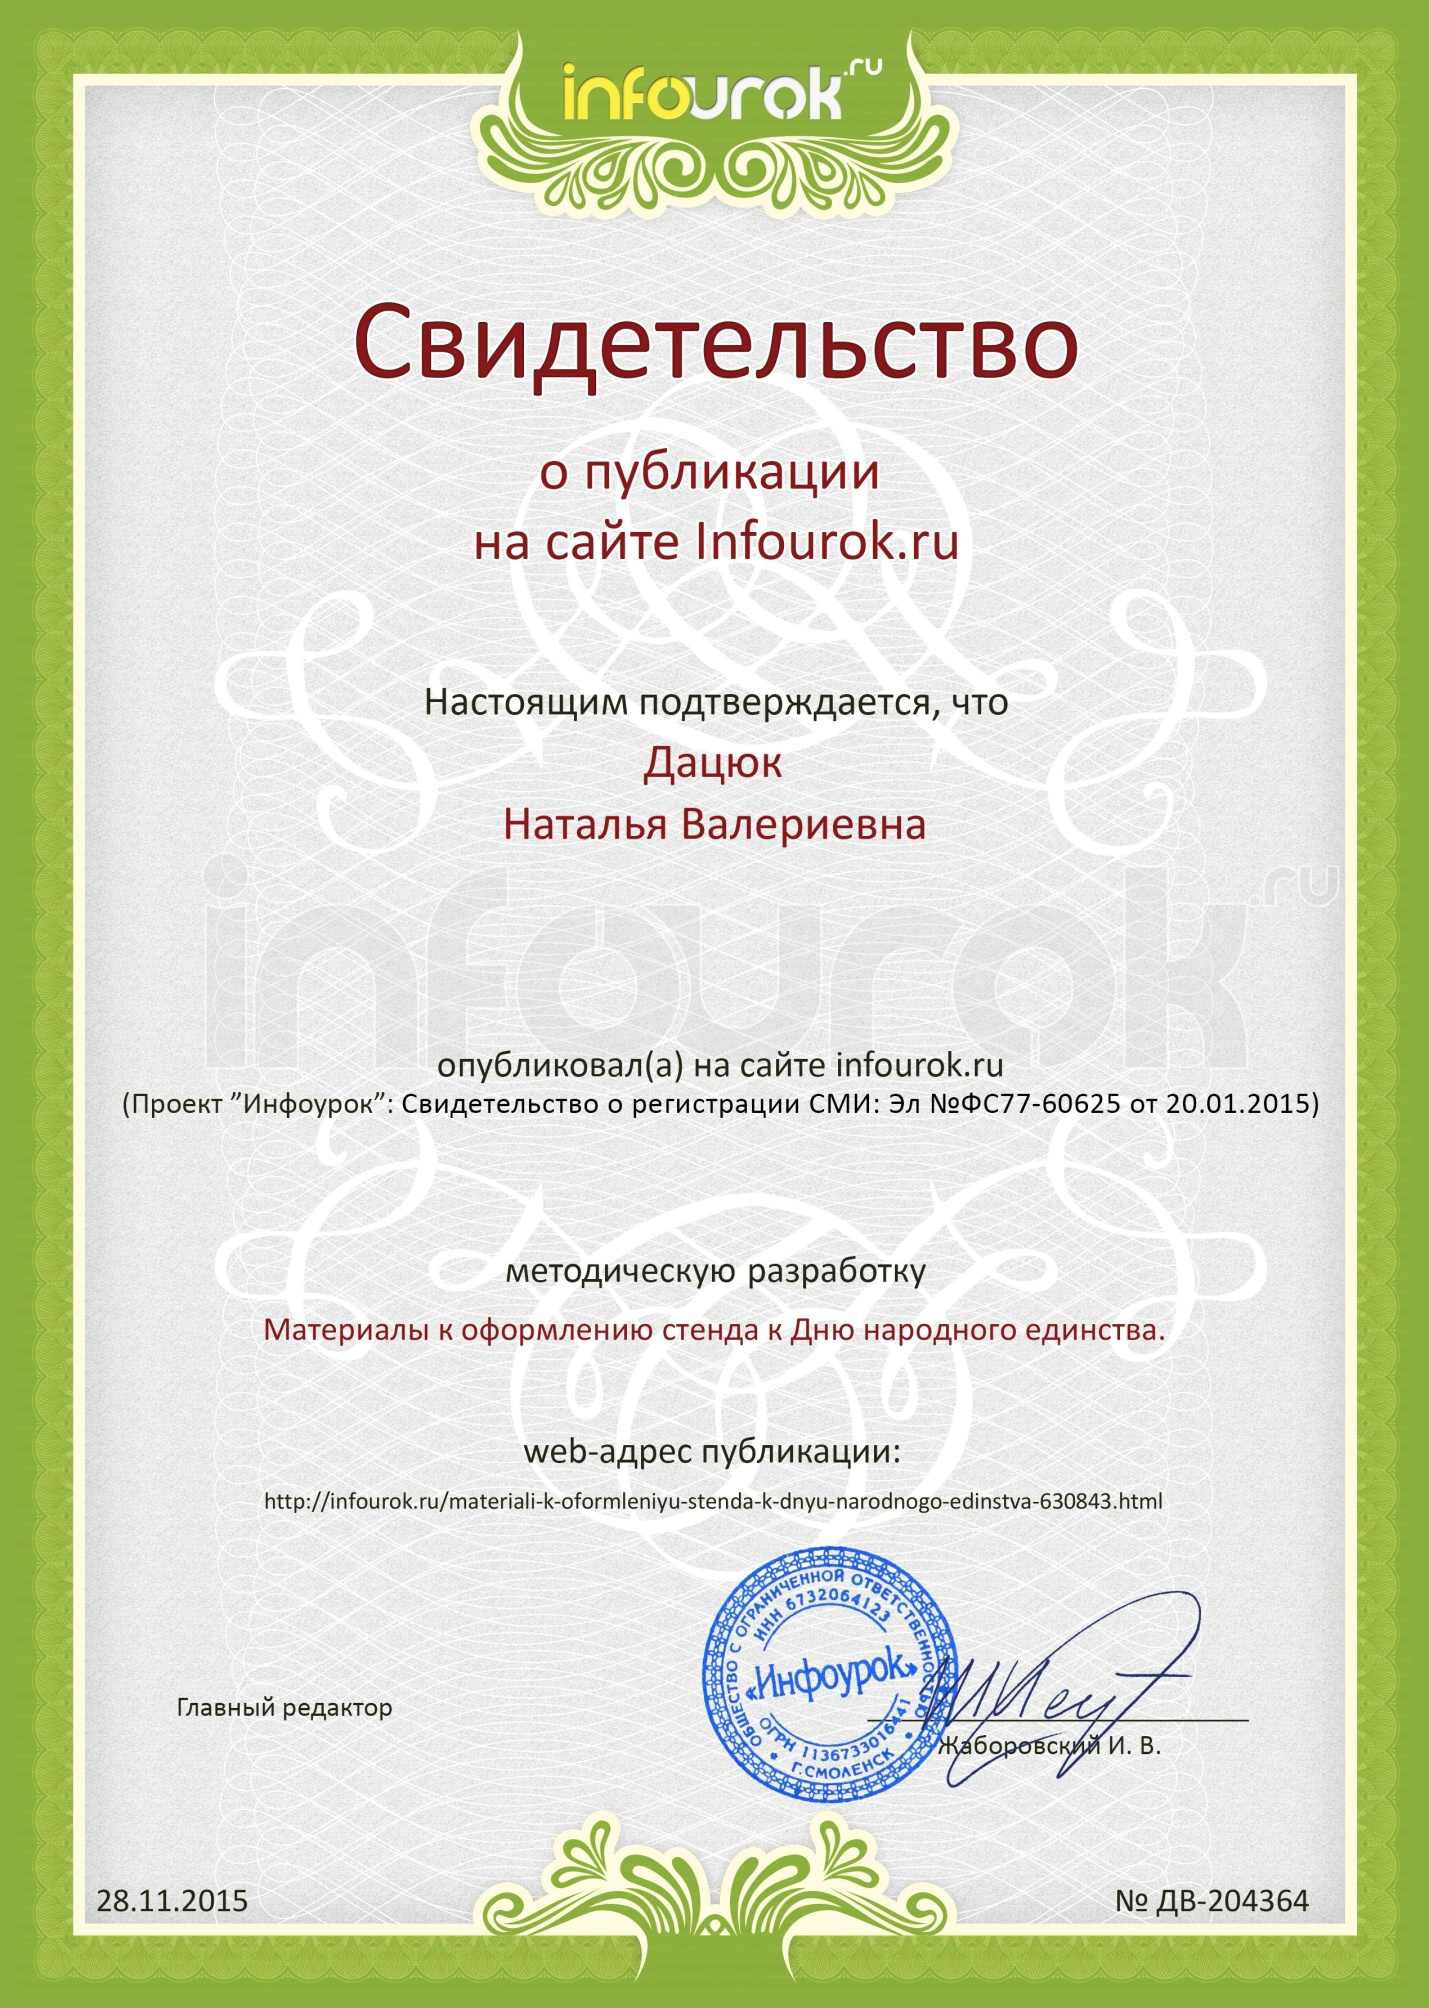 Сертификат проекта infourok.ru № ДВ-204364.jpg